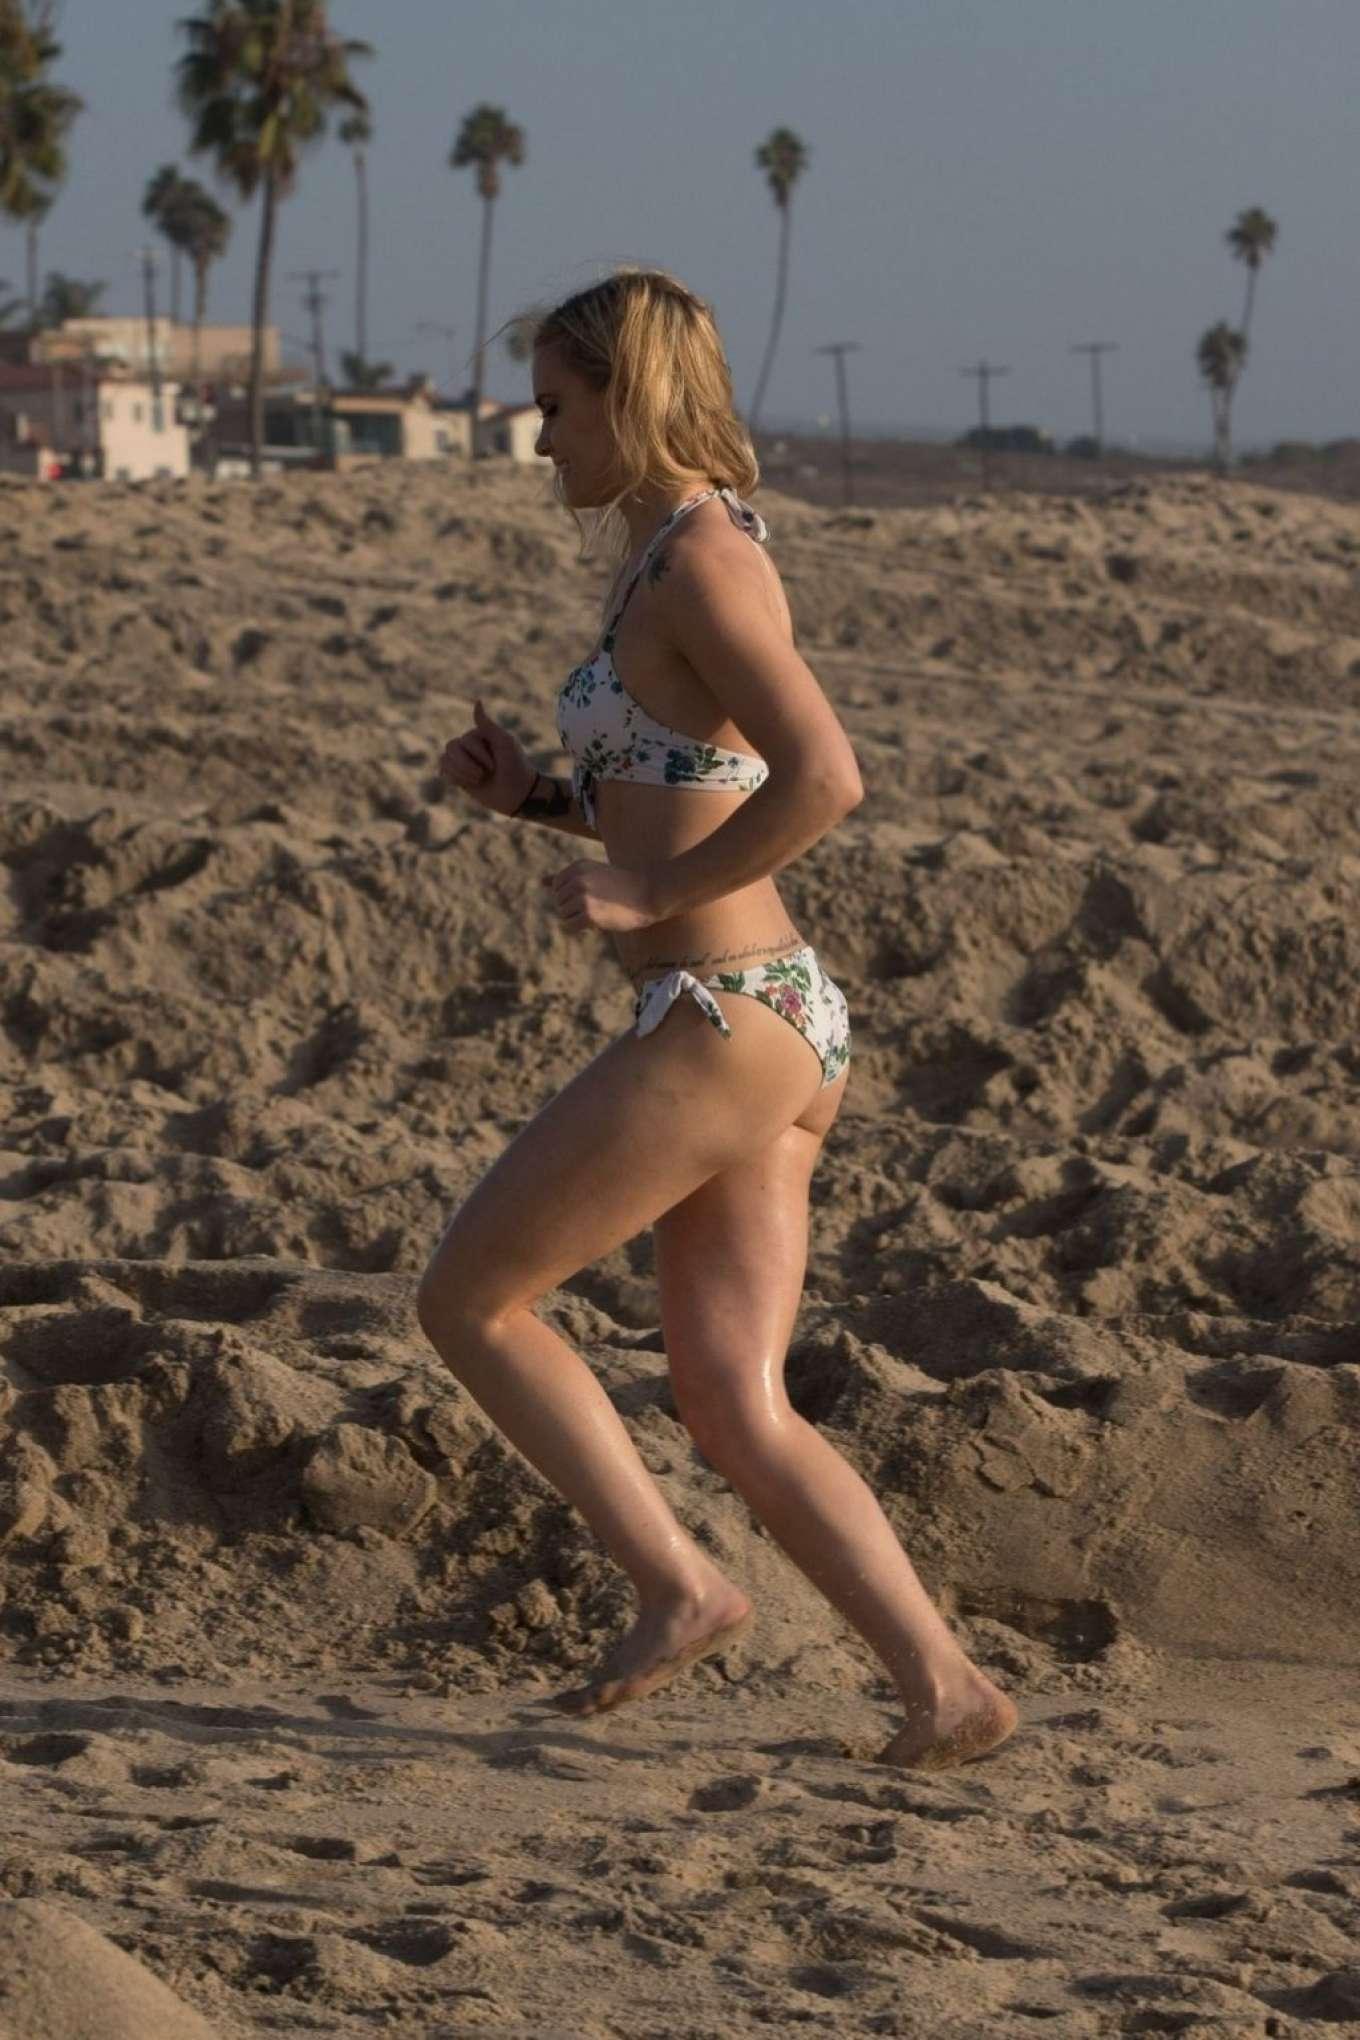 Katie Cherry 2019 : Katie Cherry in Floral Bikini 2019-06